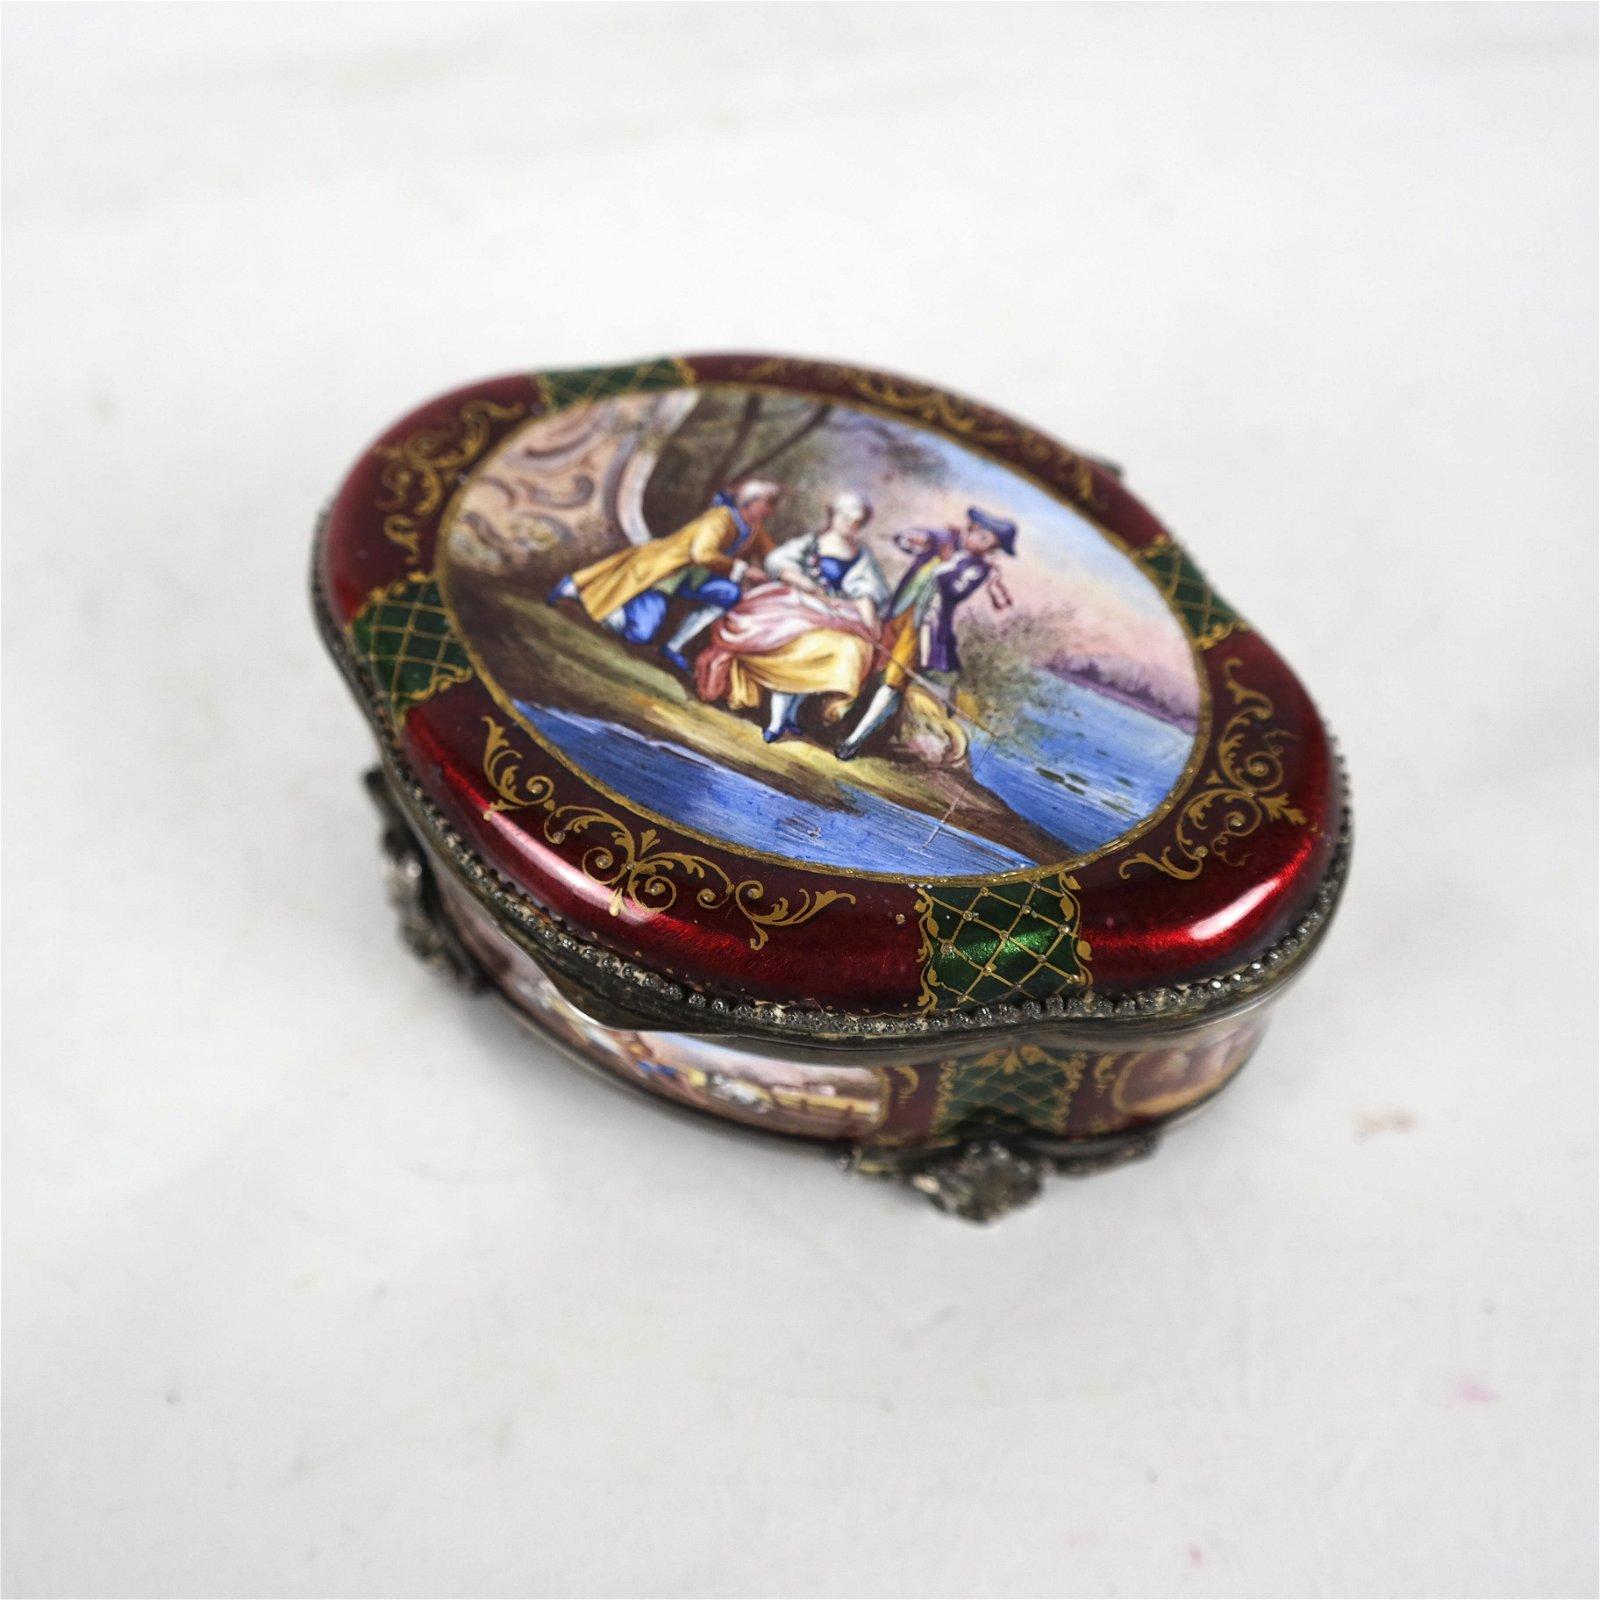 Royal Vienna Porcelain Enamel Hinged Box